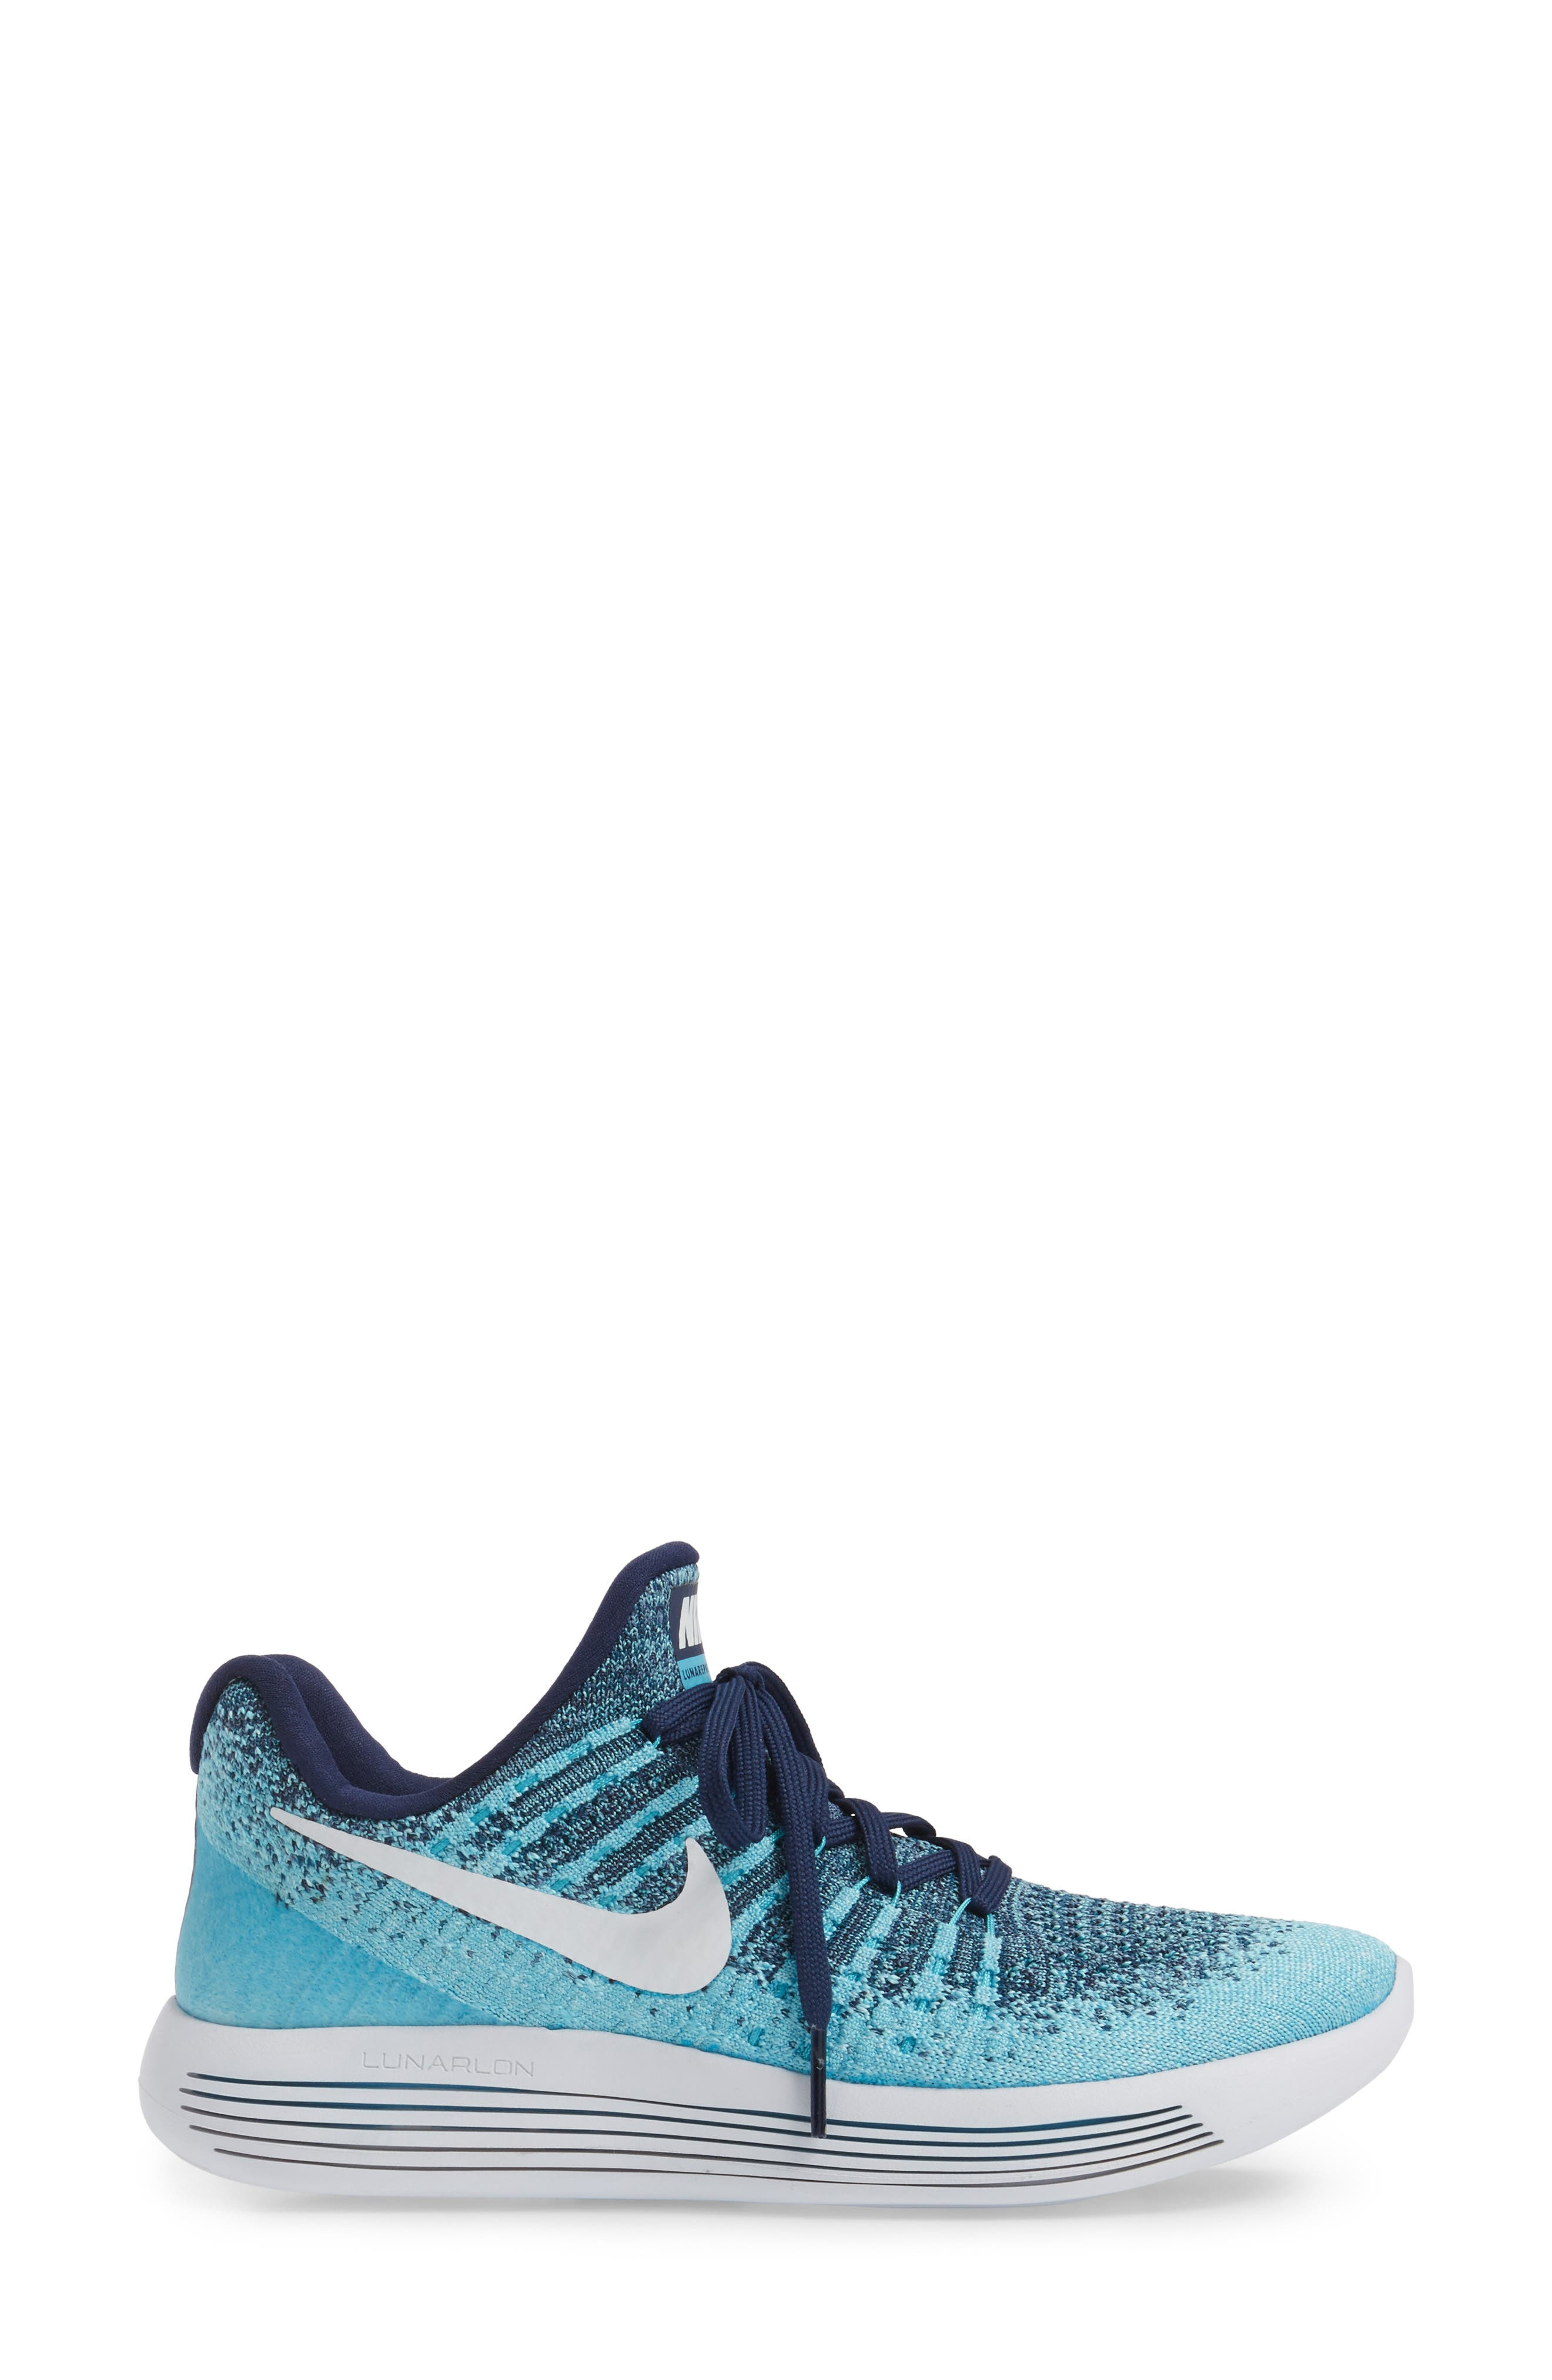 LunarEpic Low Flyknit 2 Running Shoe,                             Alternate thumbnail 55, color,